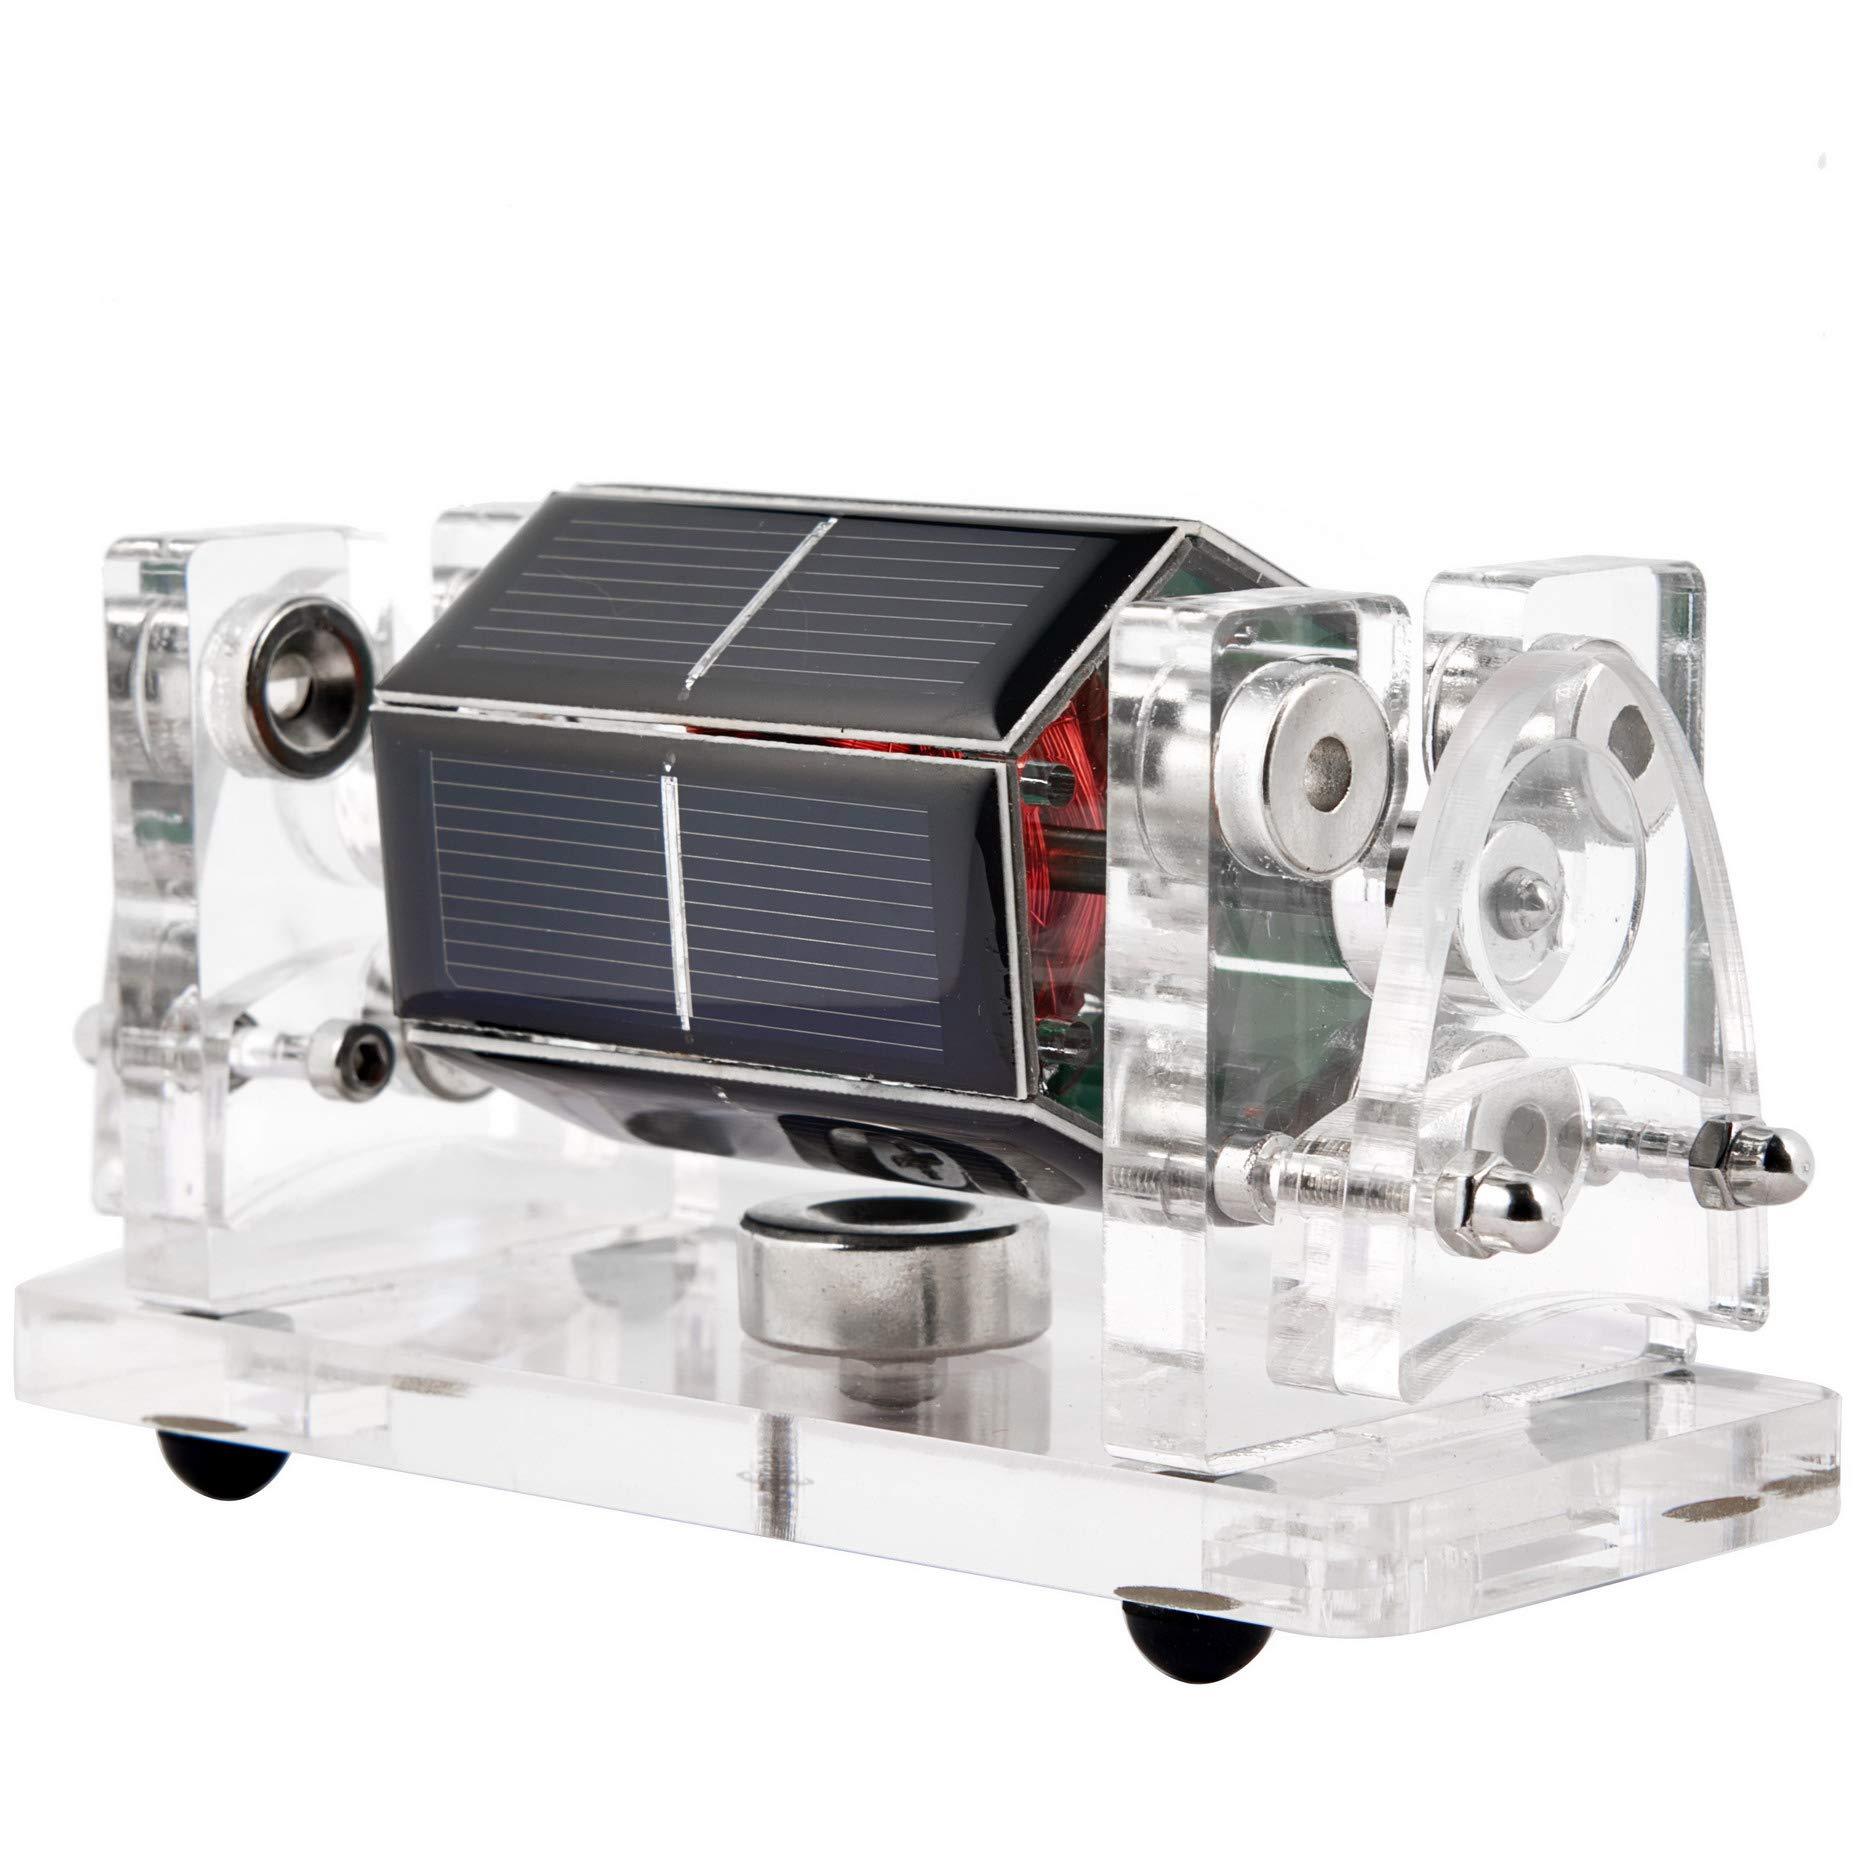 Sunnytech Solar Magnetic Levitation Model Levitating Mendocino Motor Educational Model Three Point Positioning to Avoid Shaking QZ01 by Sunnytech (Image #4)